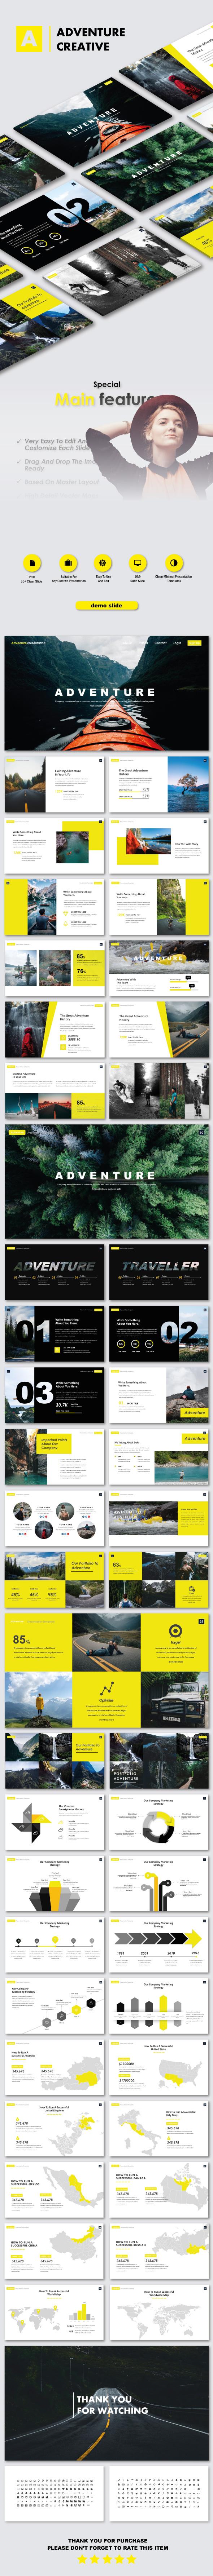 Adventure Creative Google Slide Templates - Google Slides Presentation Templates